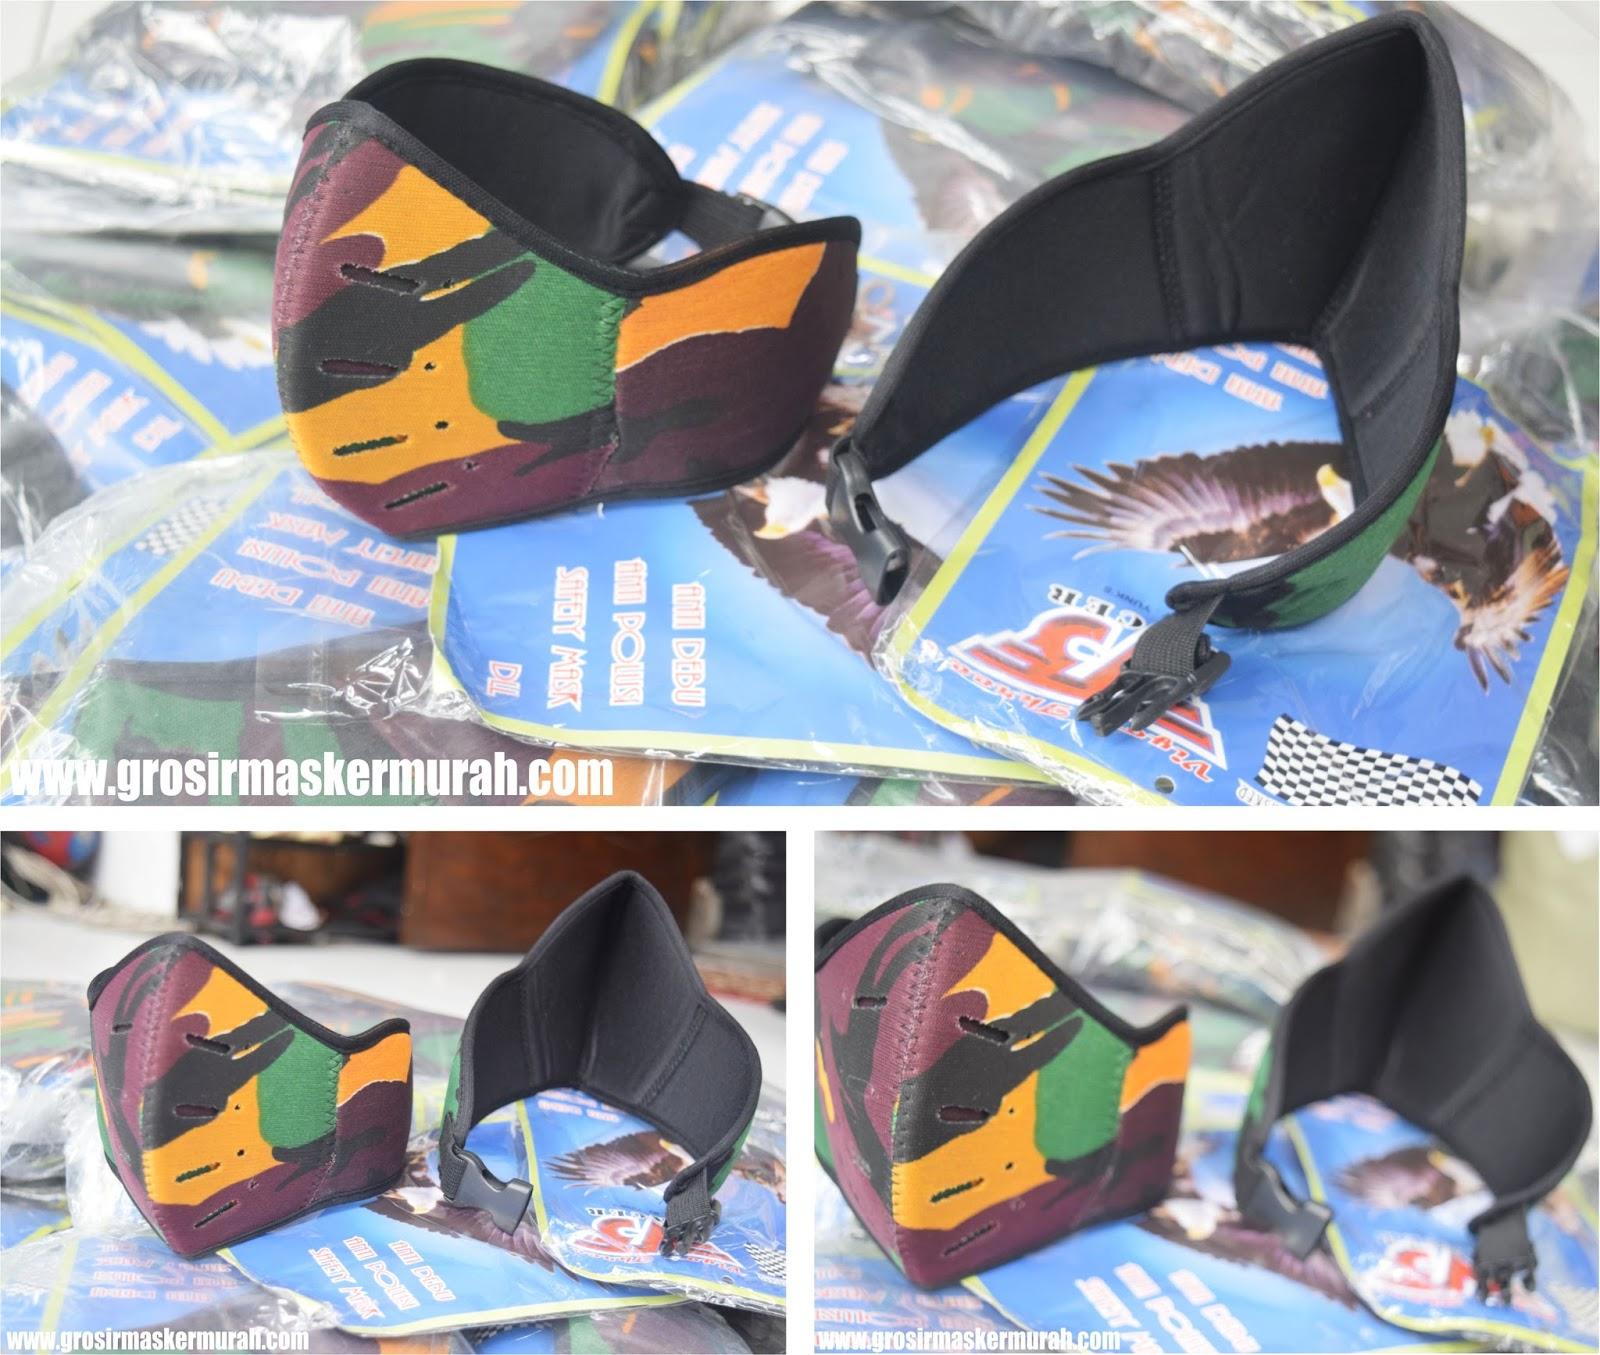 Grosir Masker Murah Harga Pabrik 16rb Lsn Buff Bandana Serbaguna Beli Lebih Banyak Info Selengkapnya Hubungi Admin Motor Market Telp Sms Wa 0823 1000 1710 Pin Bbm 7fc2789e